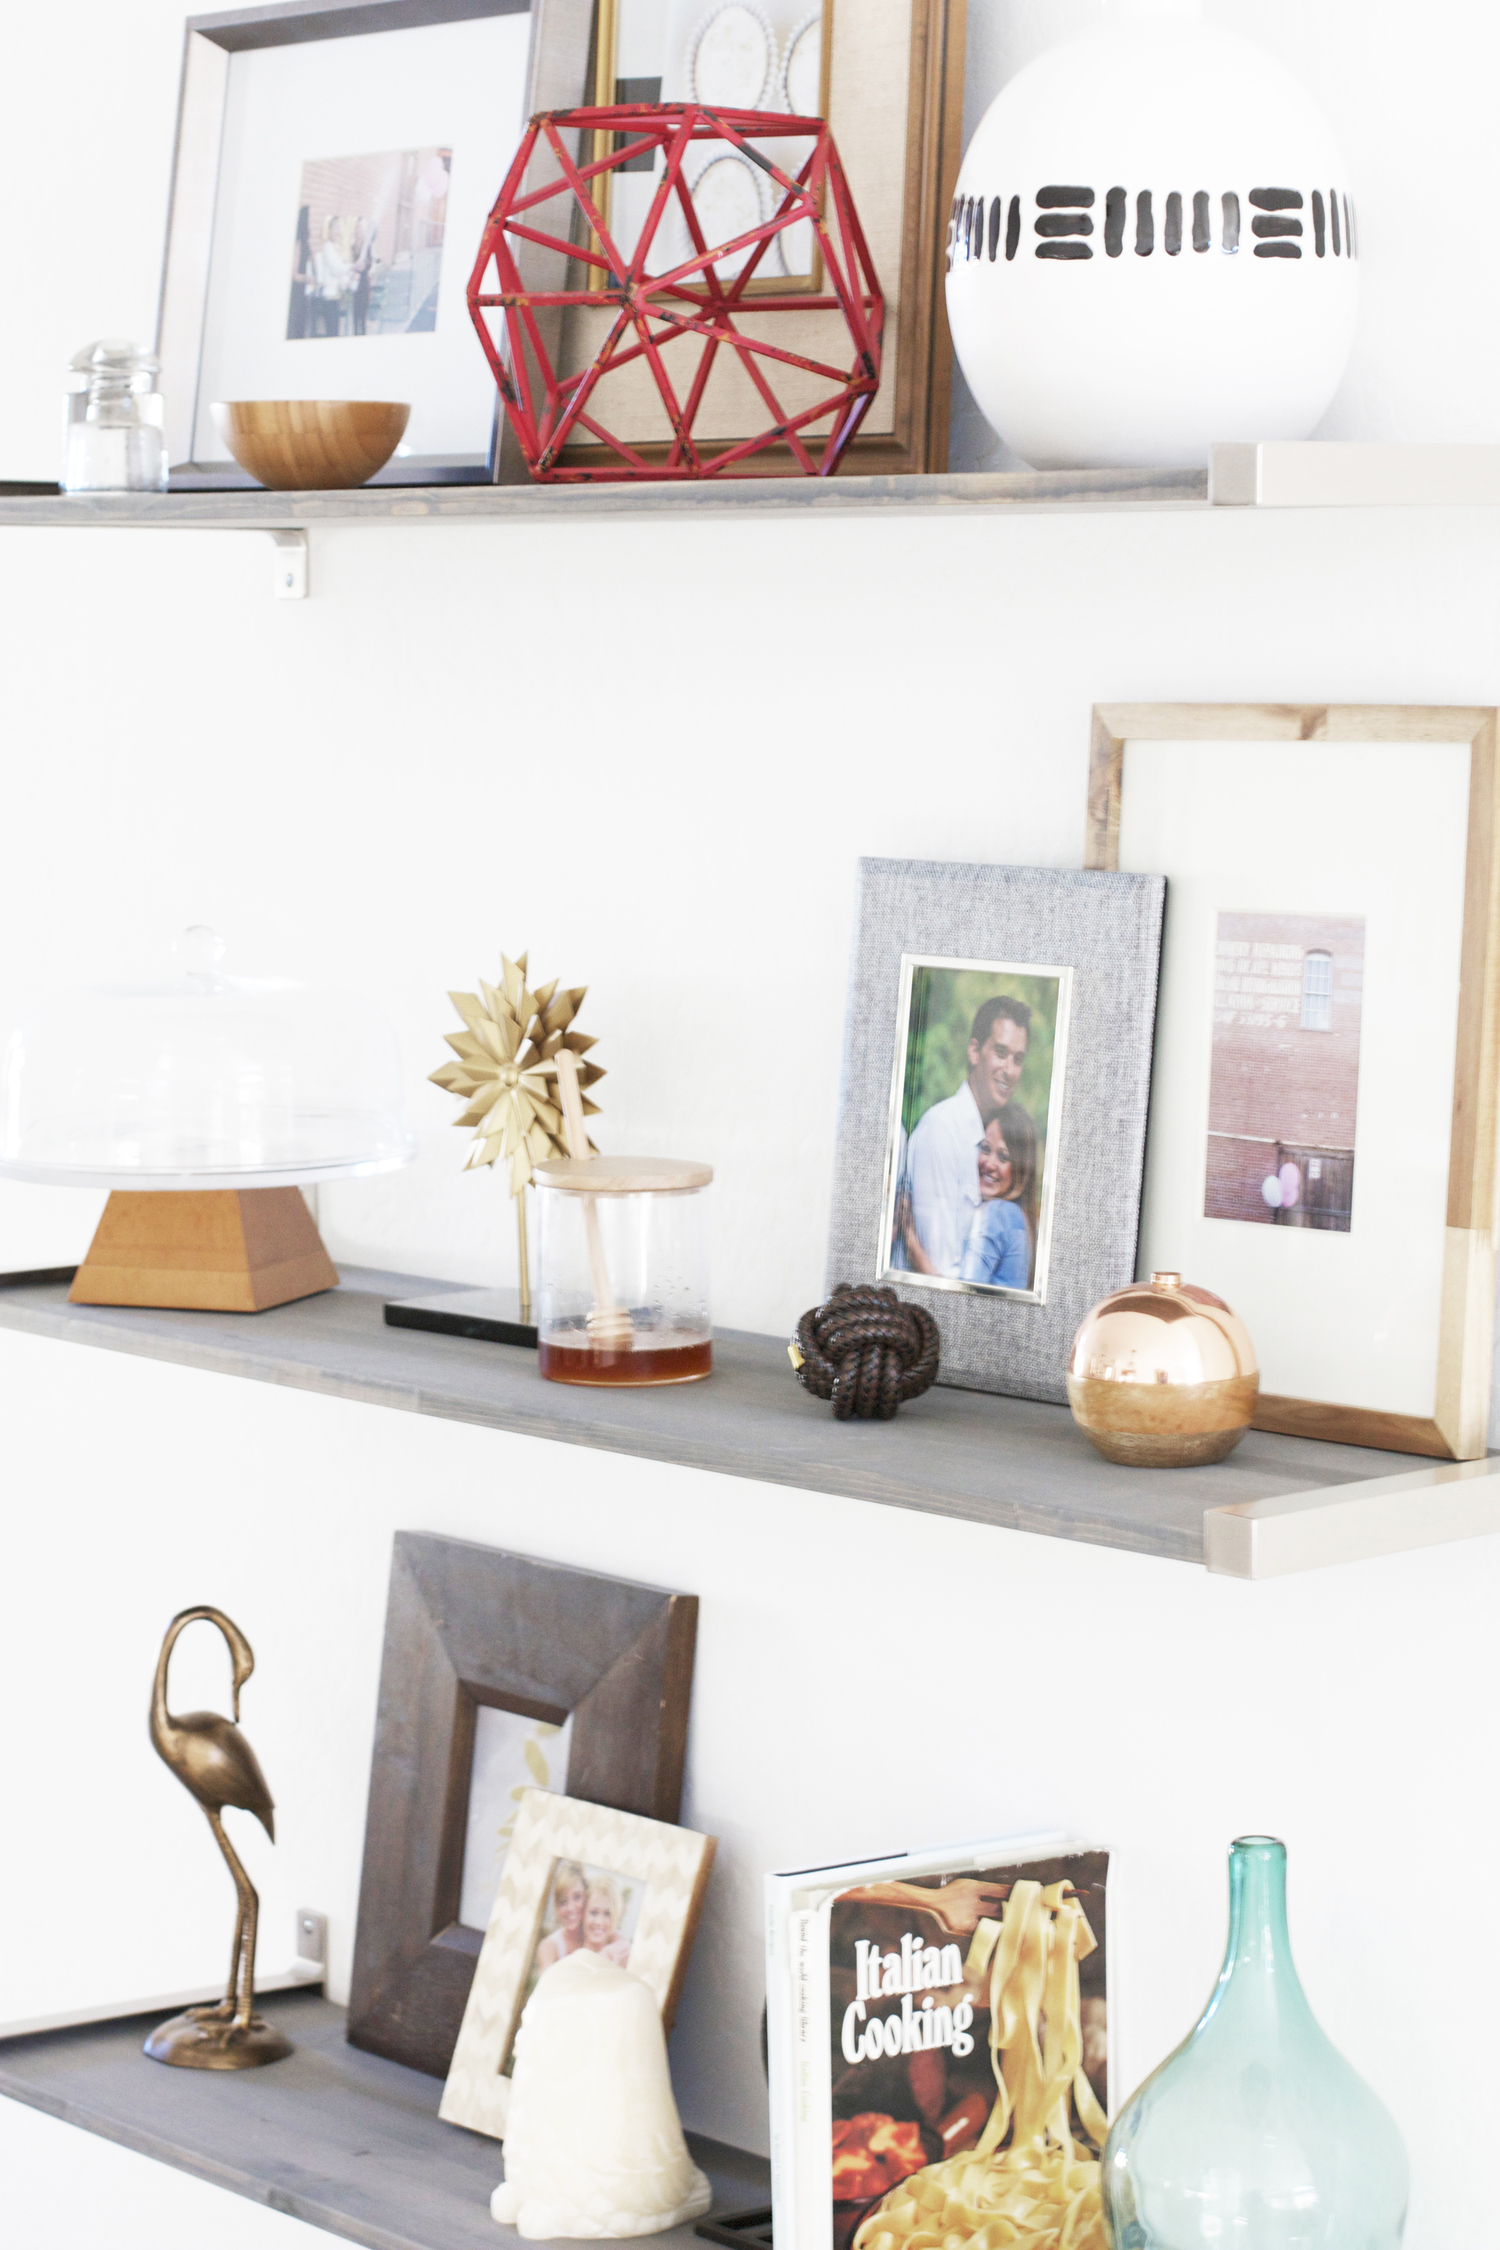 DIY gray shelves